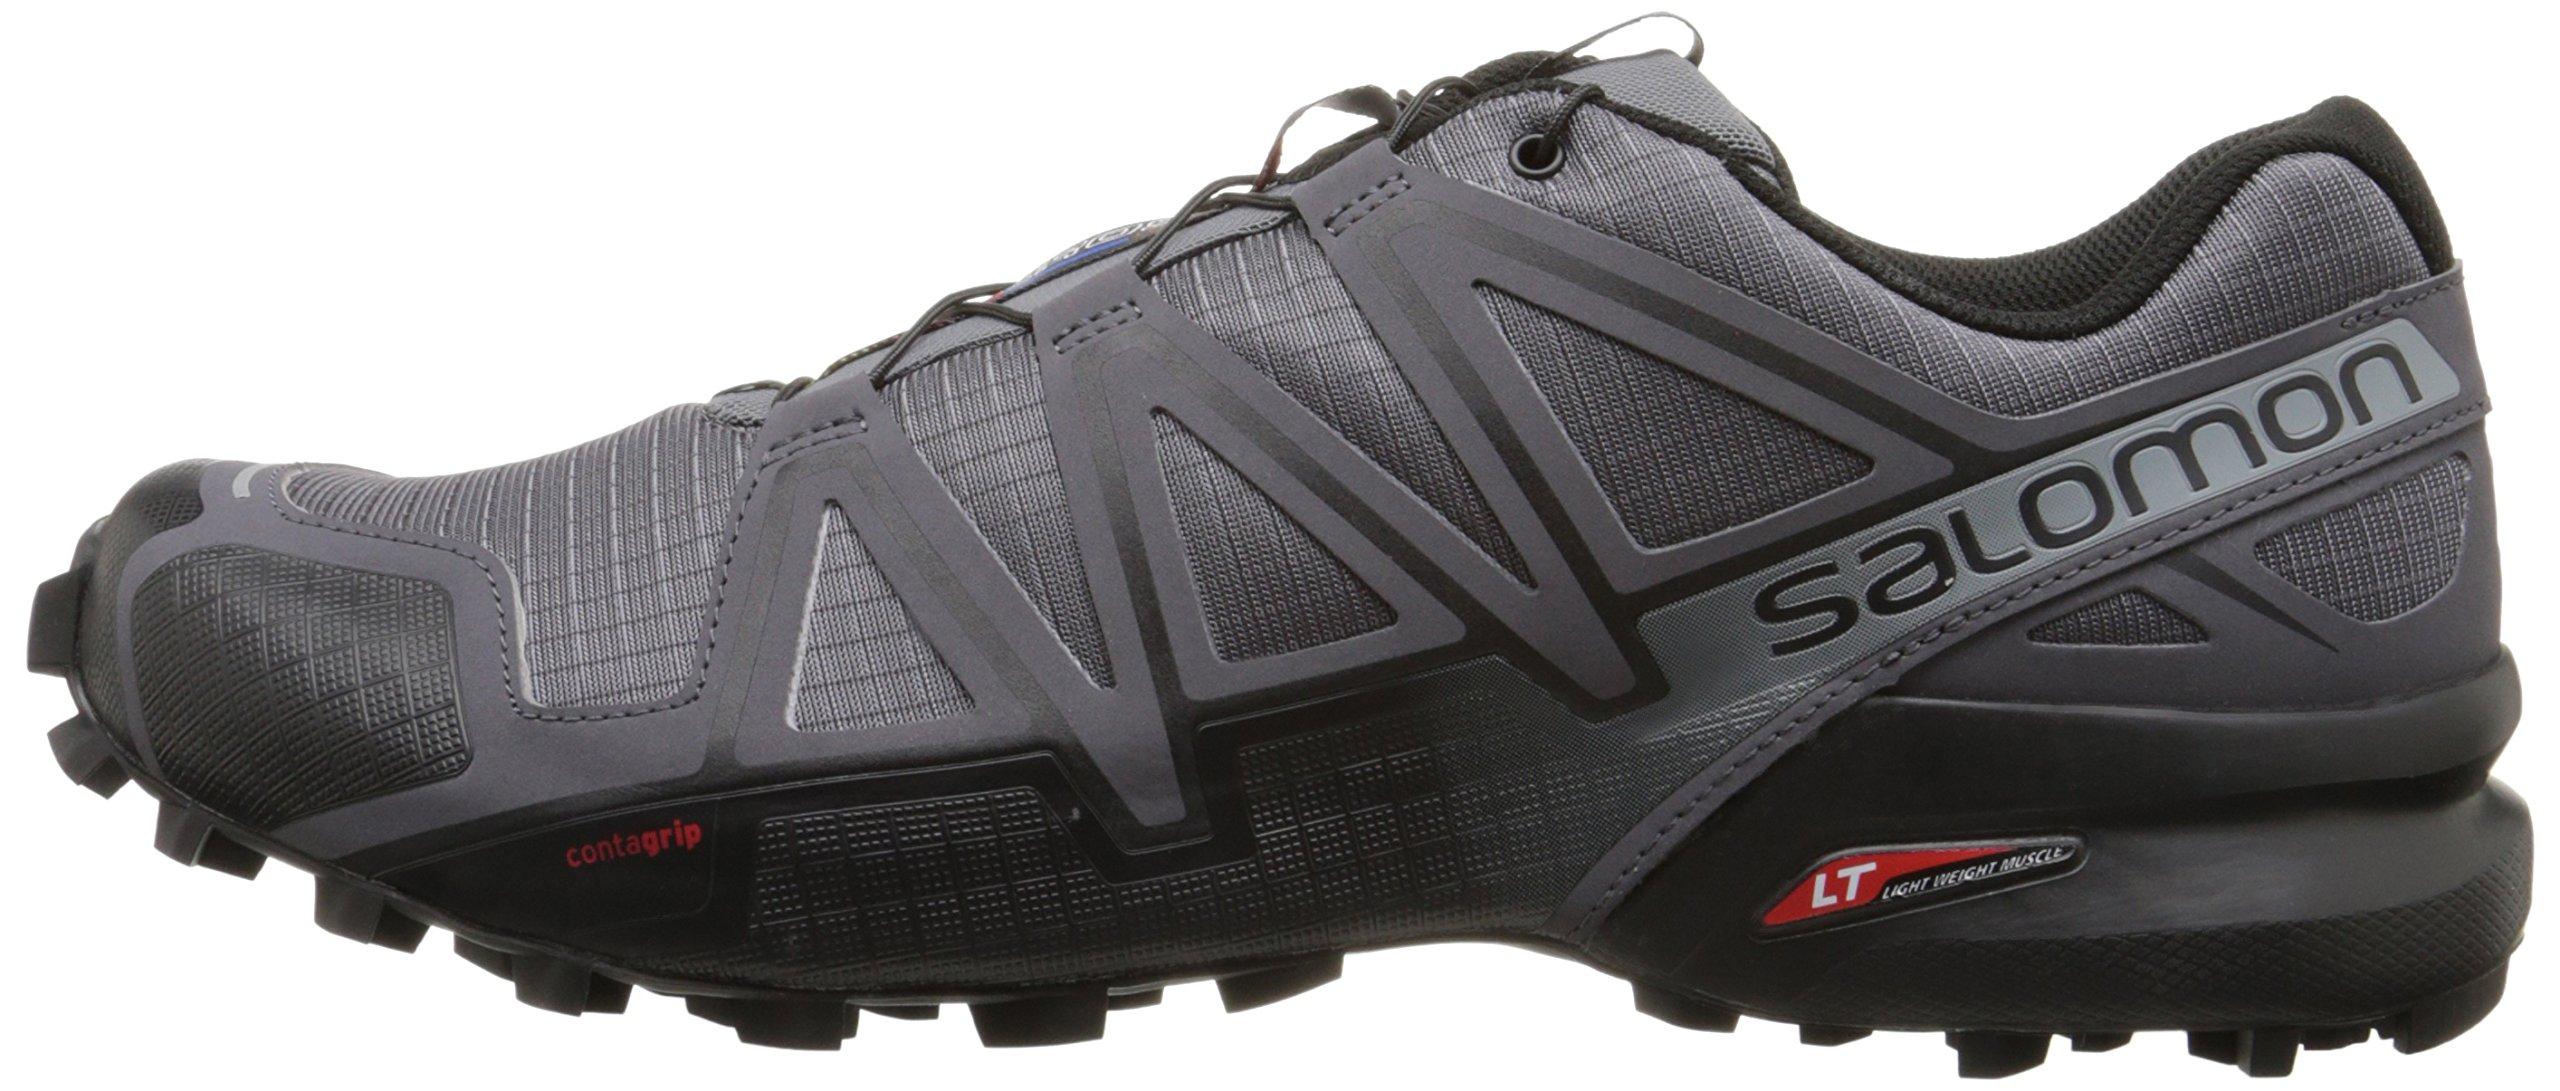 Salomon Men's Speedcross 4 Trail Runner, Dark Cloud, 7 M US by Salomon (Image #6)